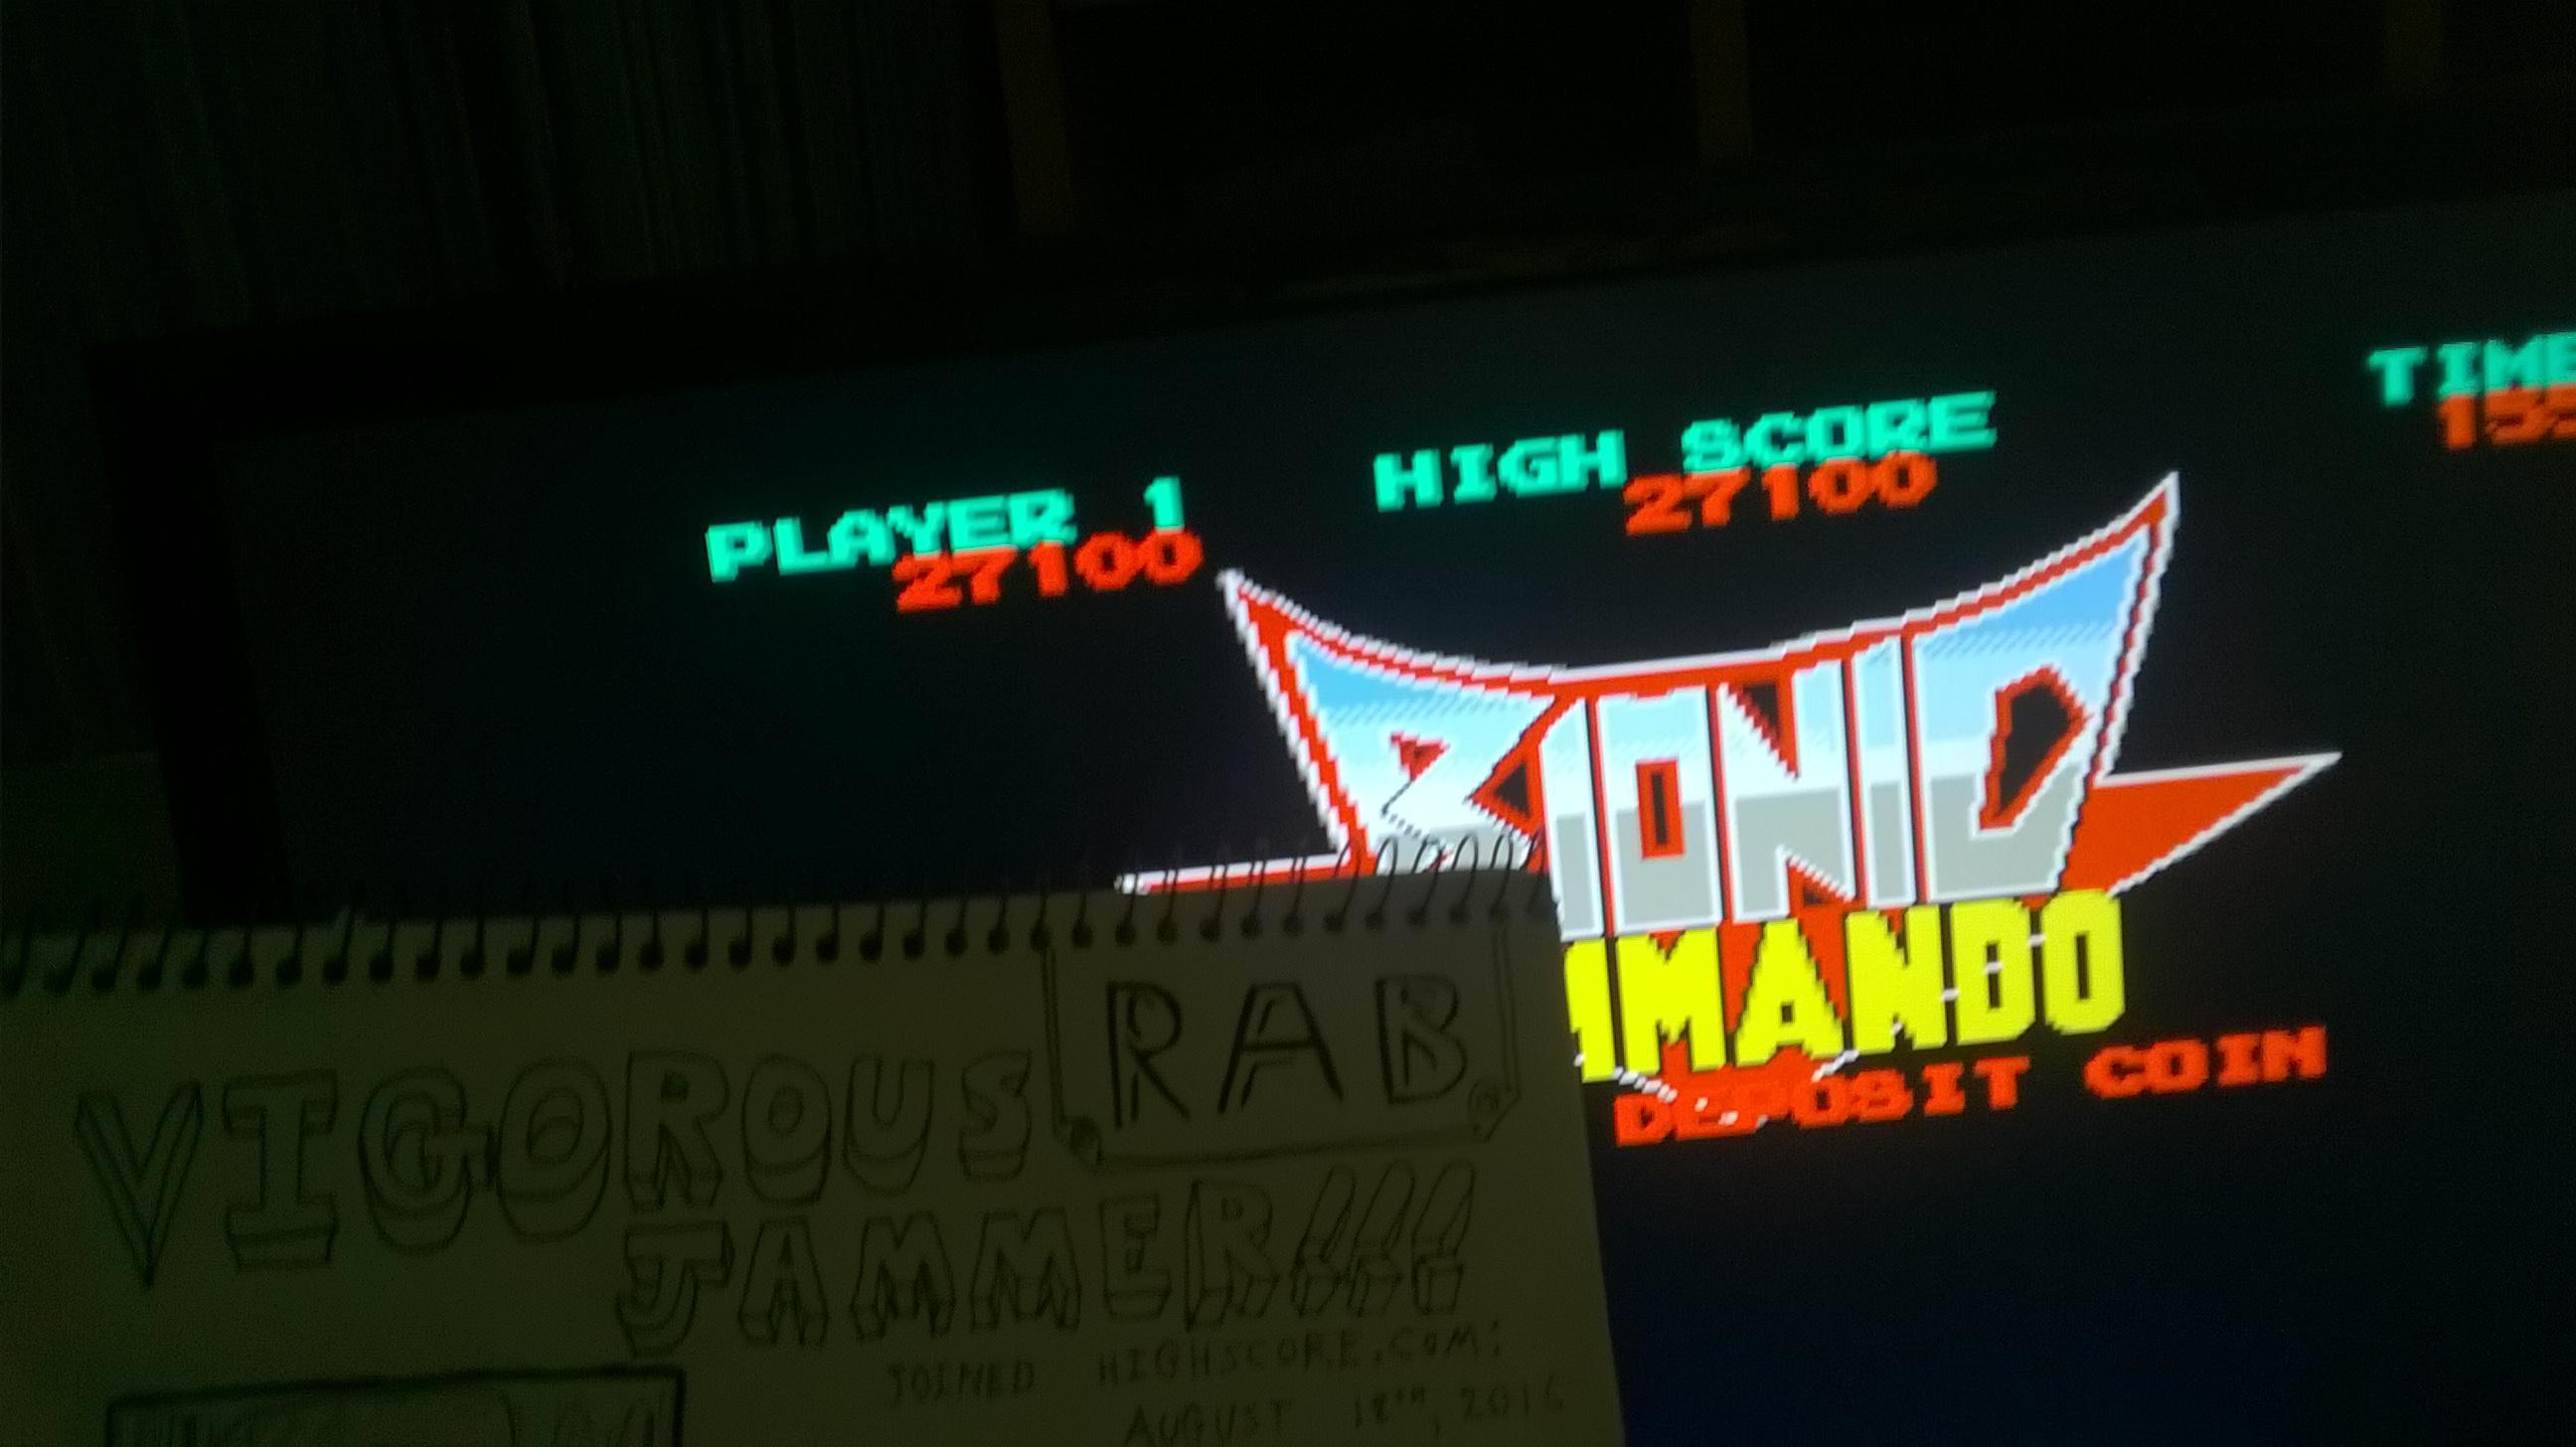 vigorousjammer: Bionic Commando [bionicc] (Arcade Emulated / M.A.M.E.) 27,100 points on 2015-09-05 16:46:07